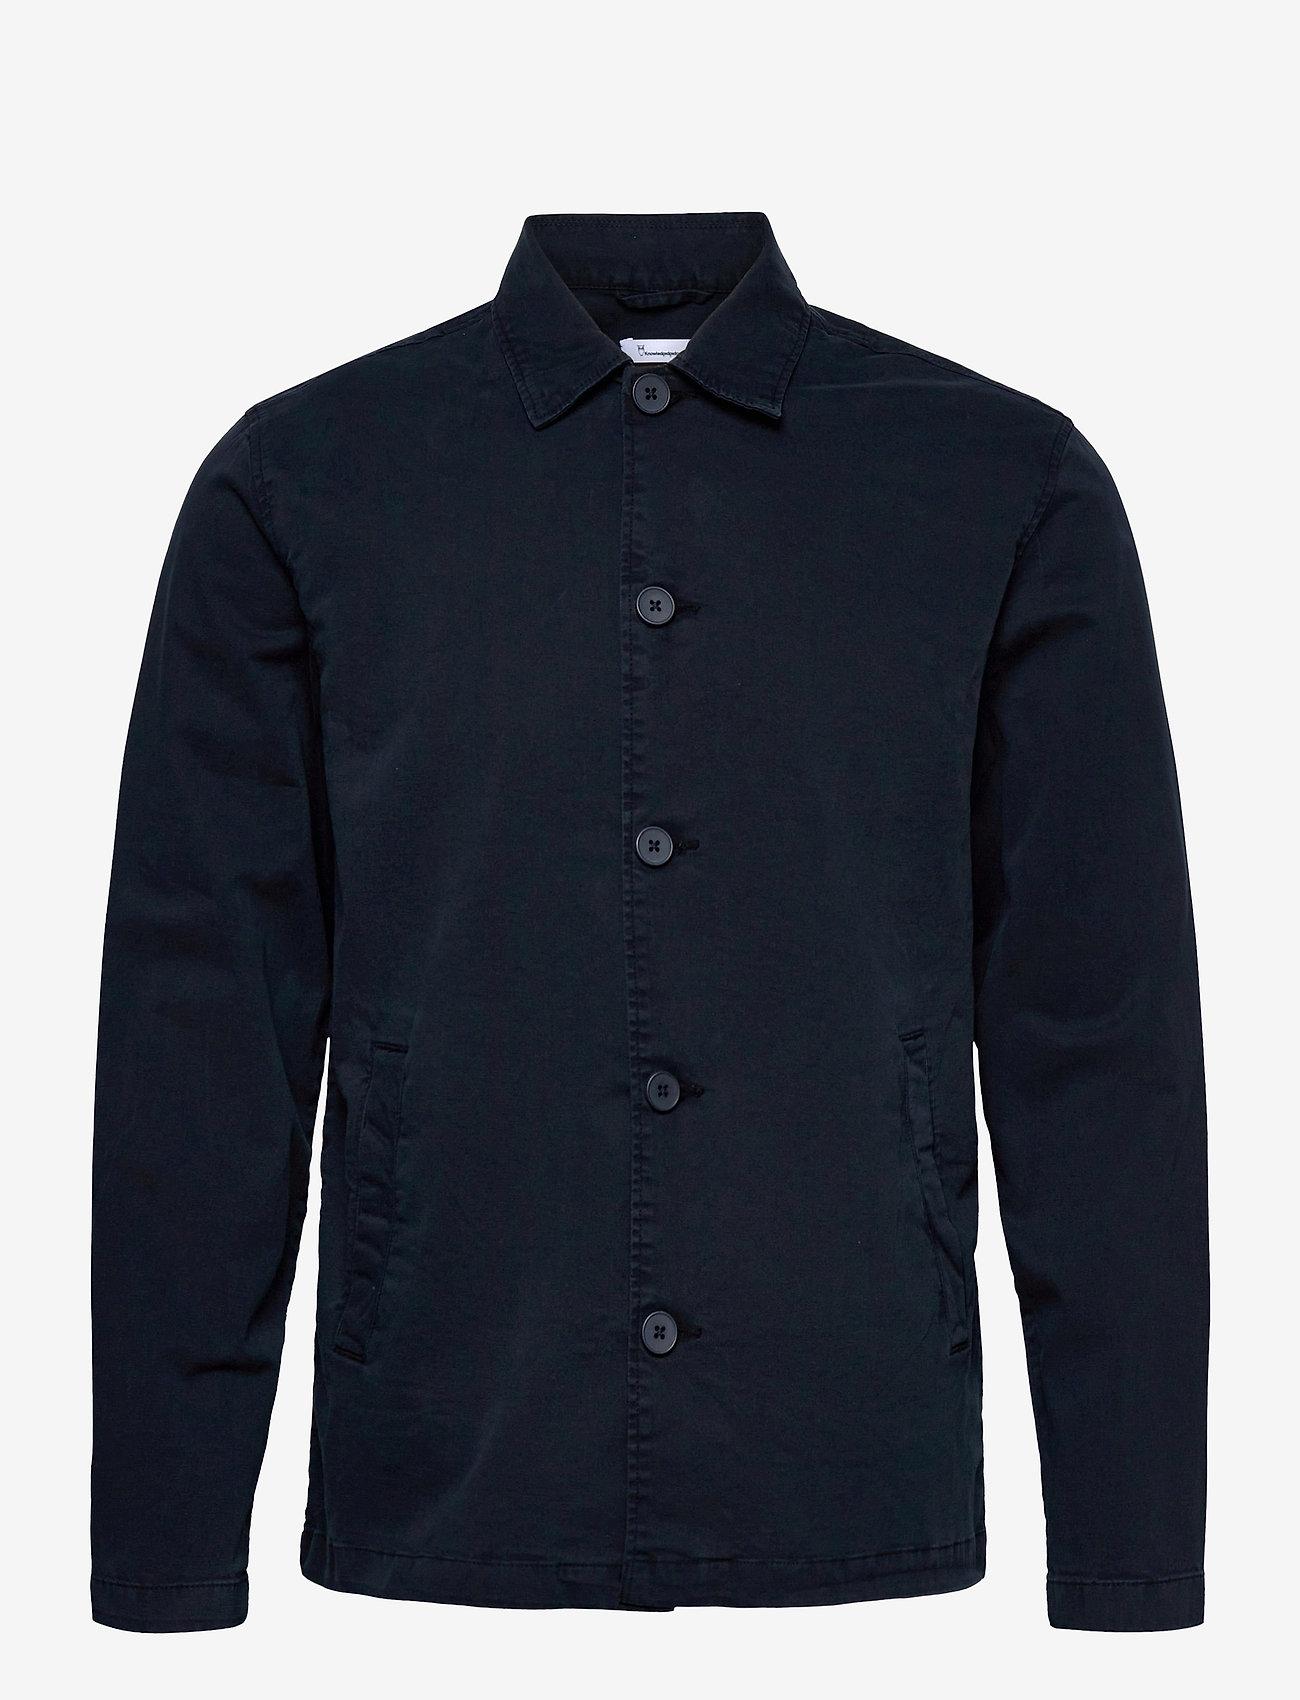 Knowledge Cotton Apparel - PINE poplin overshirt - GOTS/Vegan - vêtements - total eclipse - 0